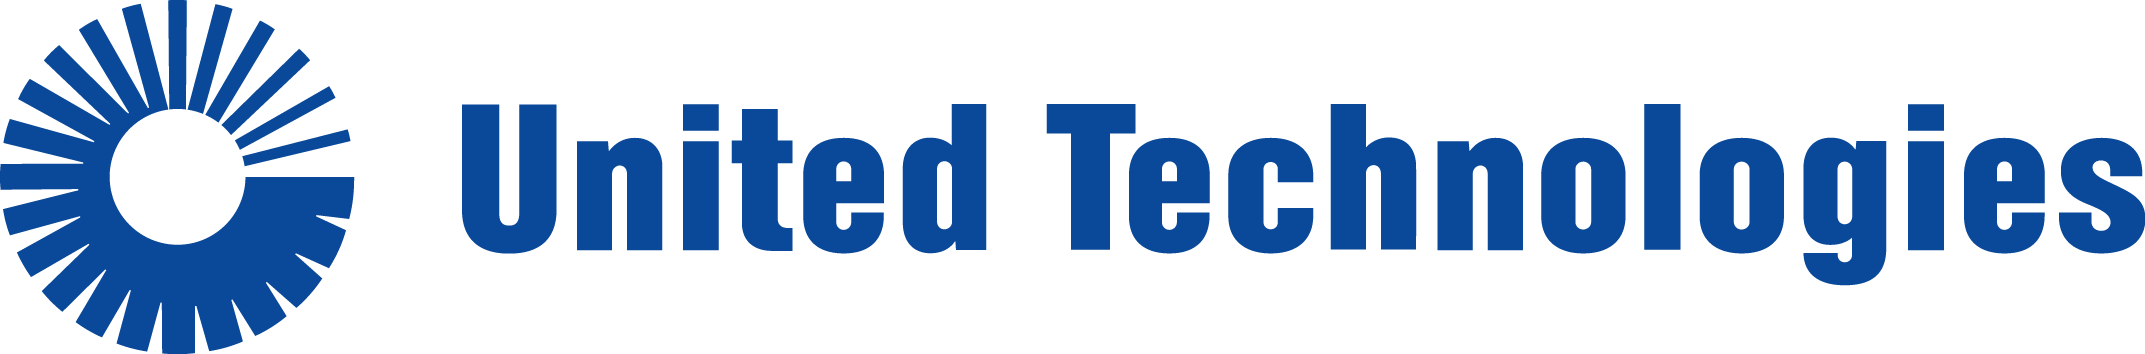 UTC Logo - click to visit their website